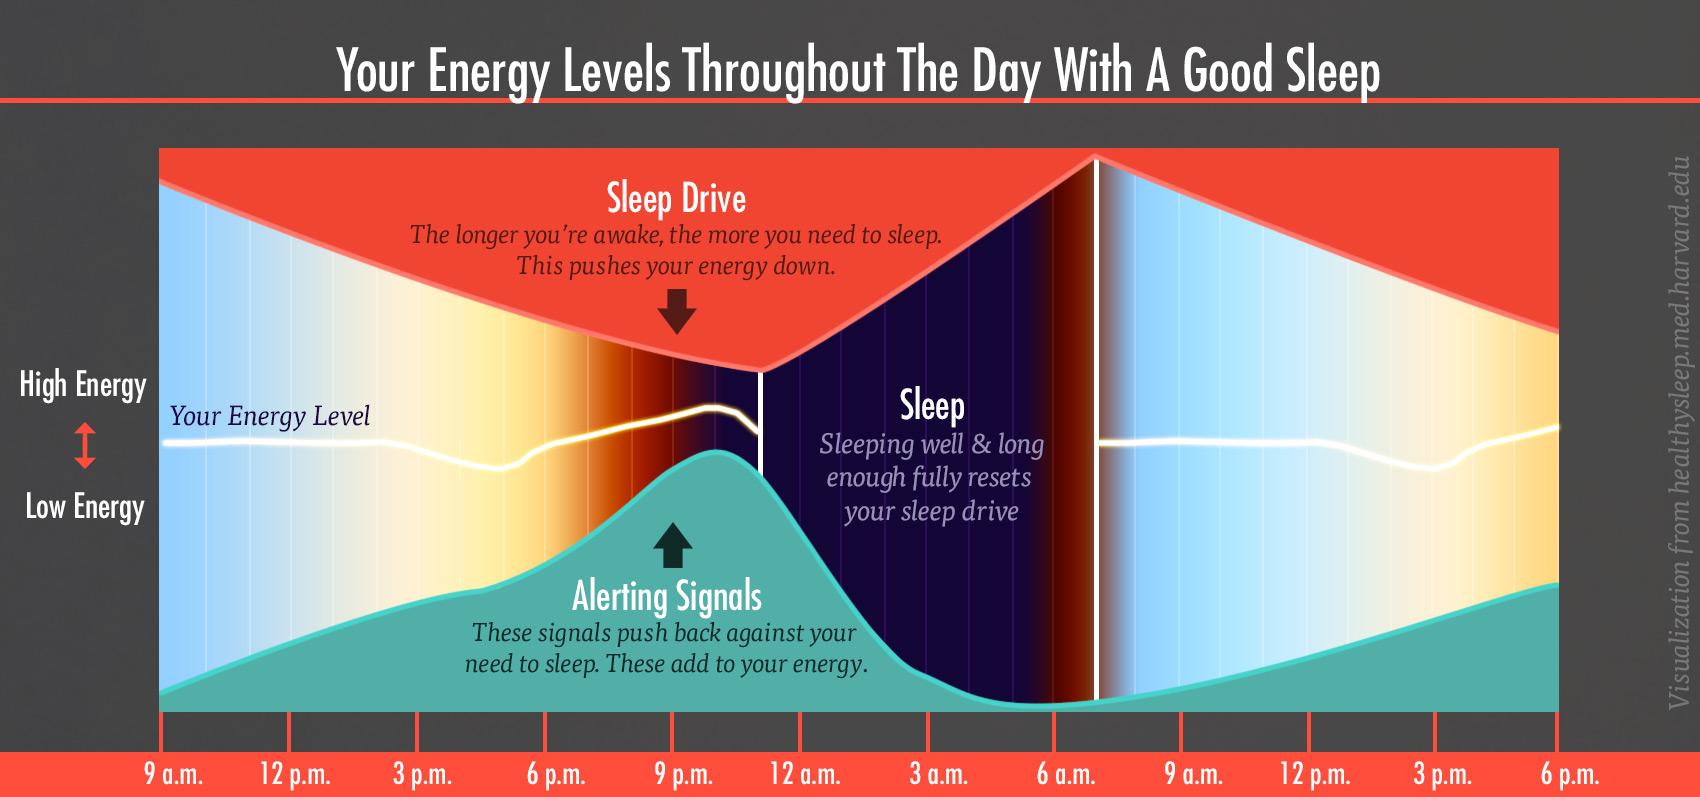 energy-levels-sleep-drive-alert-chart-1-bony-bombshell